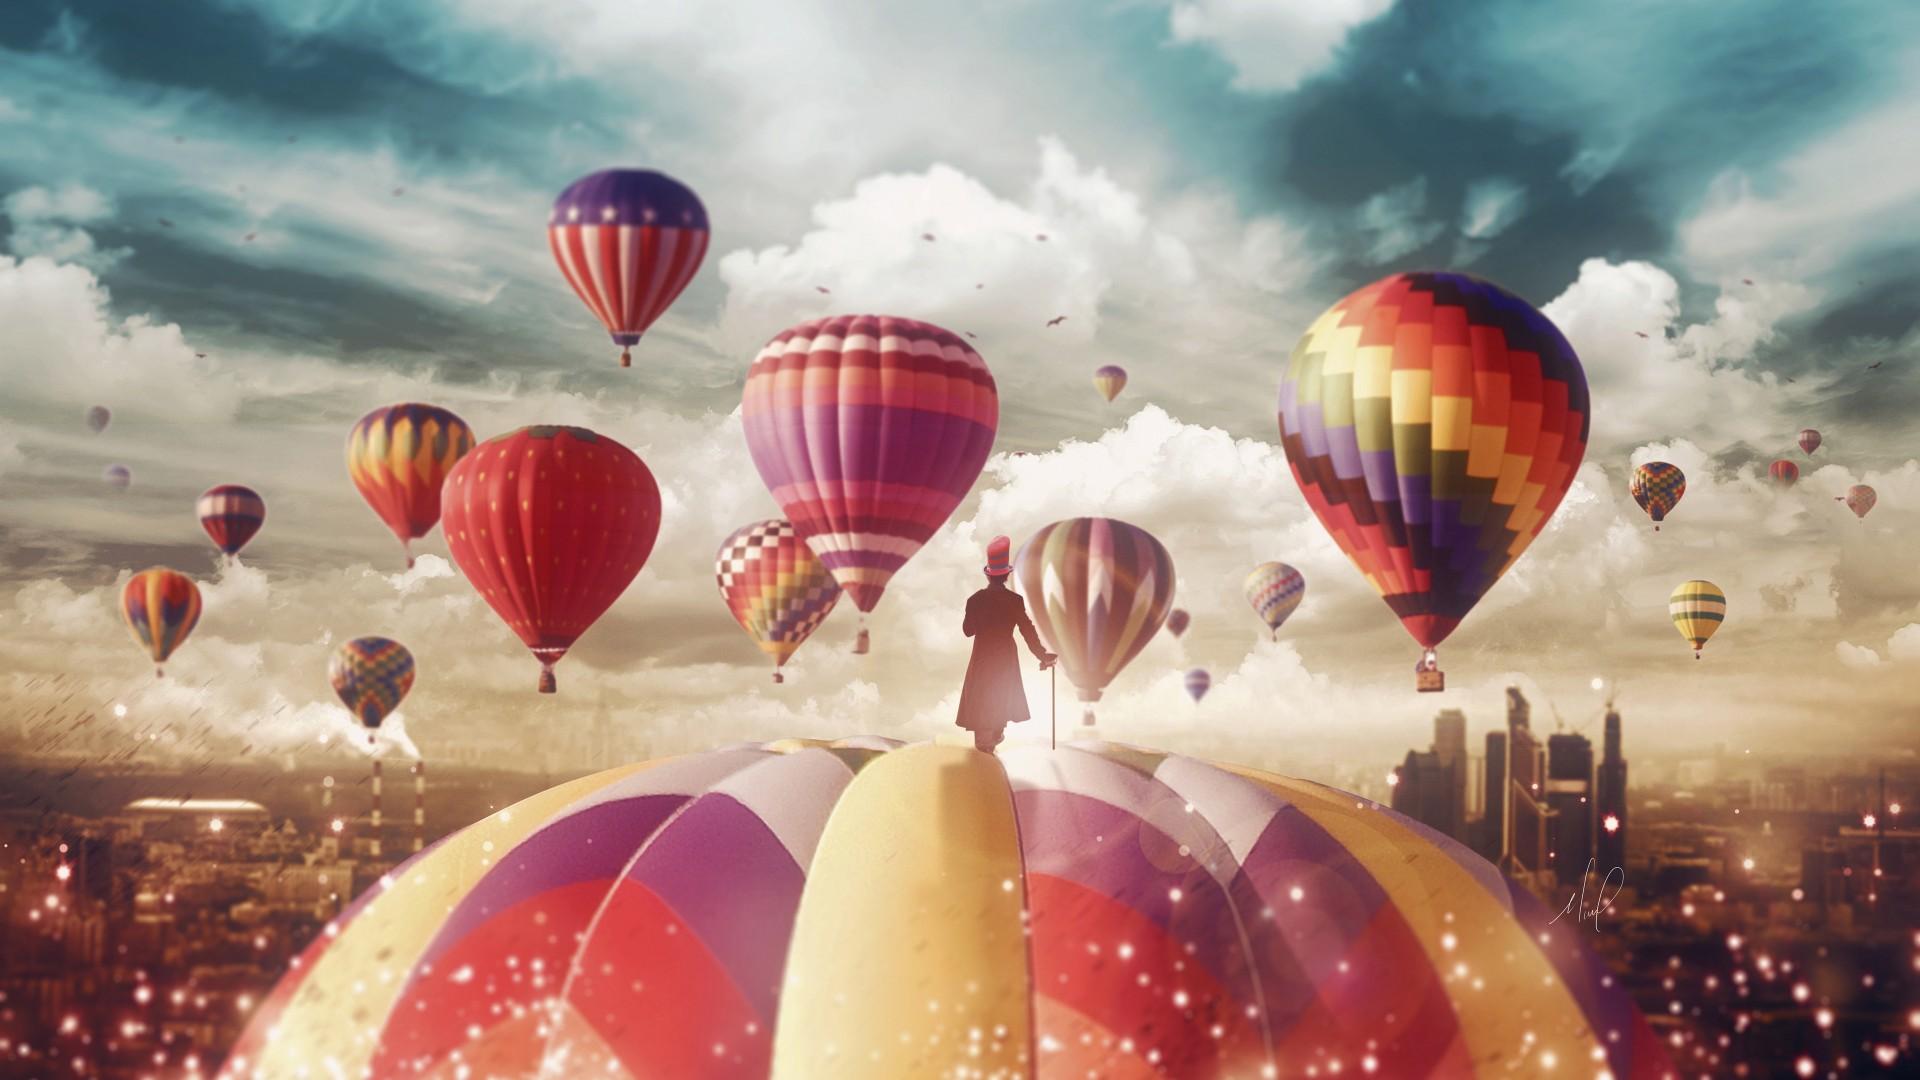 Ultra Hd Wallpapers 8k Girl Hot Air Balloons Magician 4k Wallpapers Hd Wallpapers